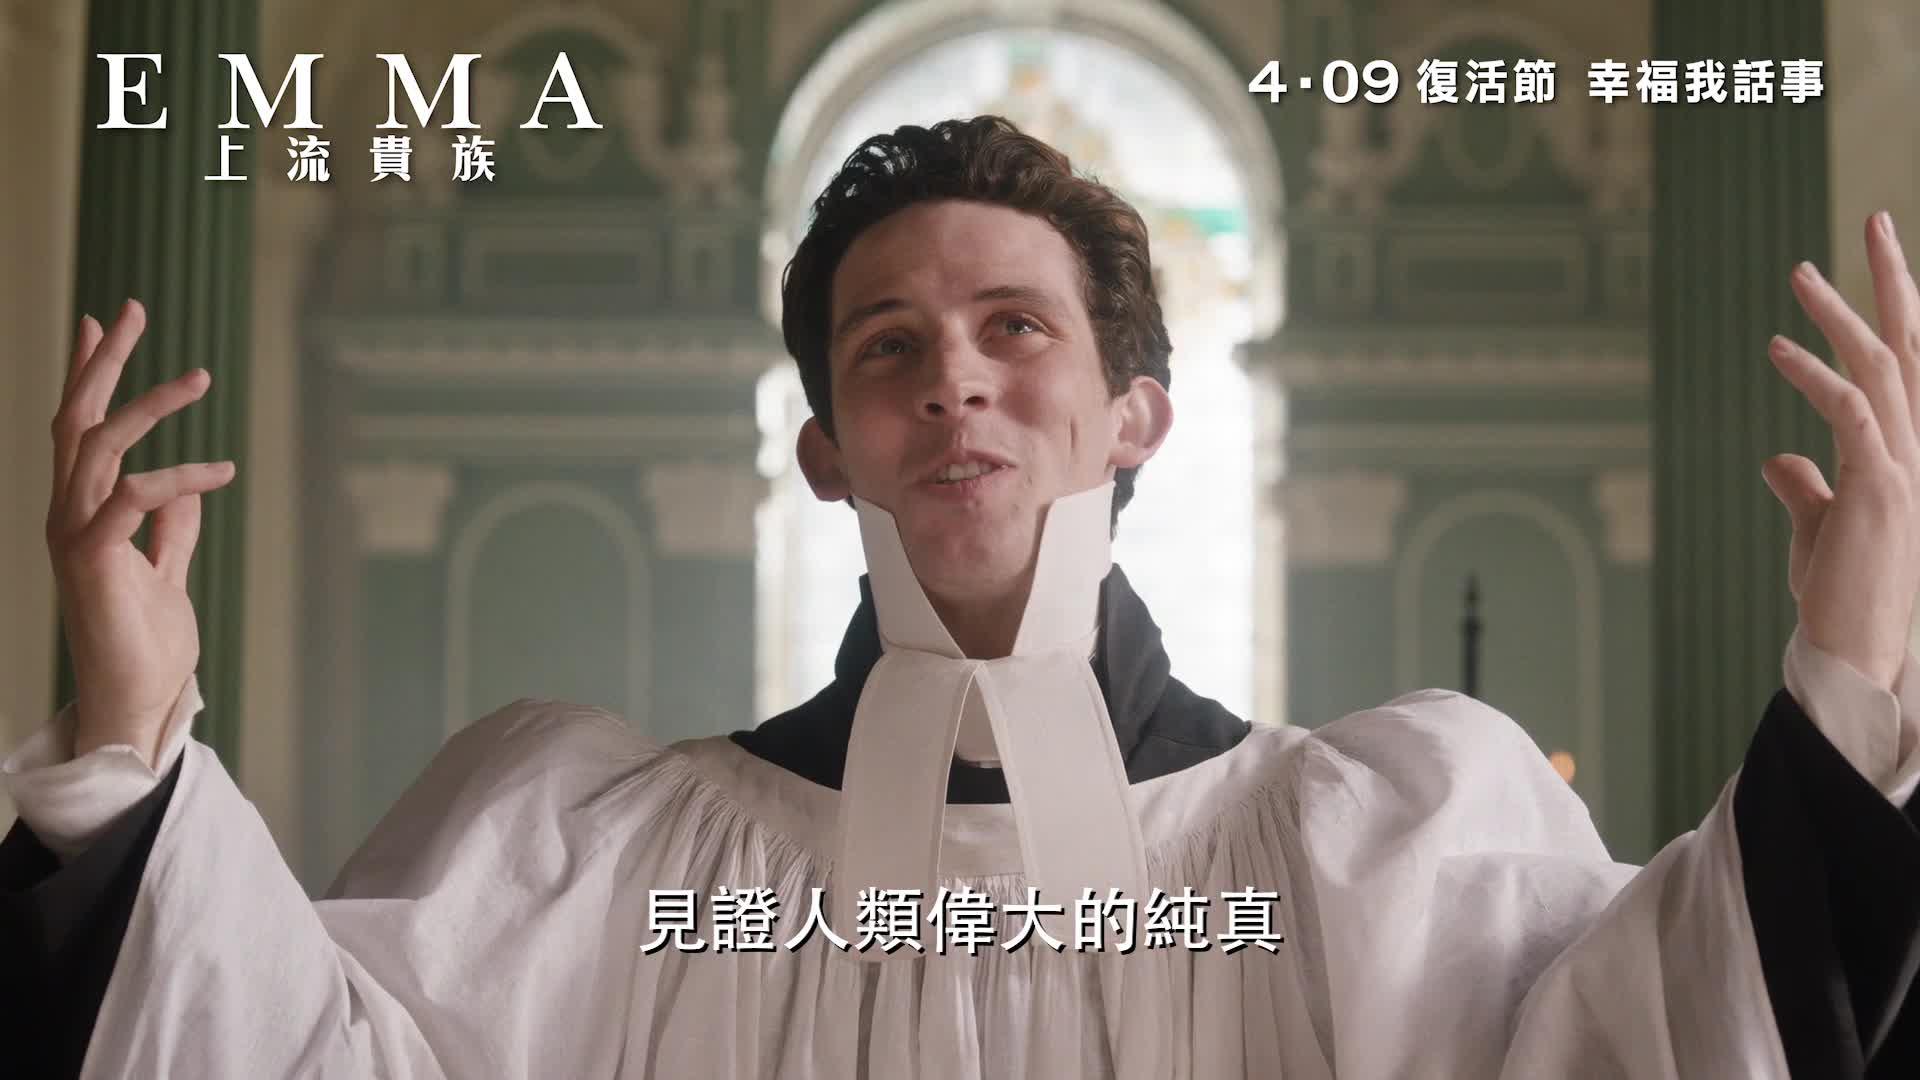 《EMMA:上流貴族》電影預告